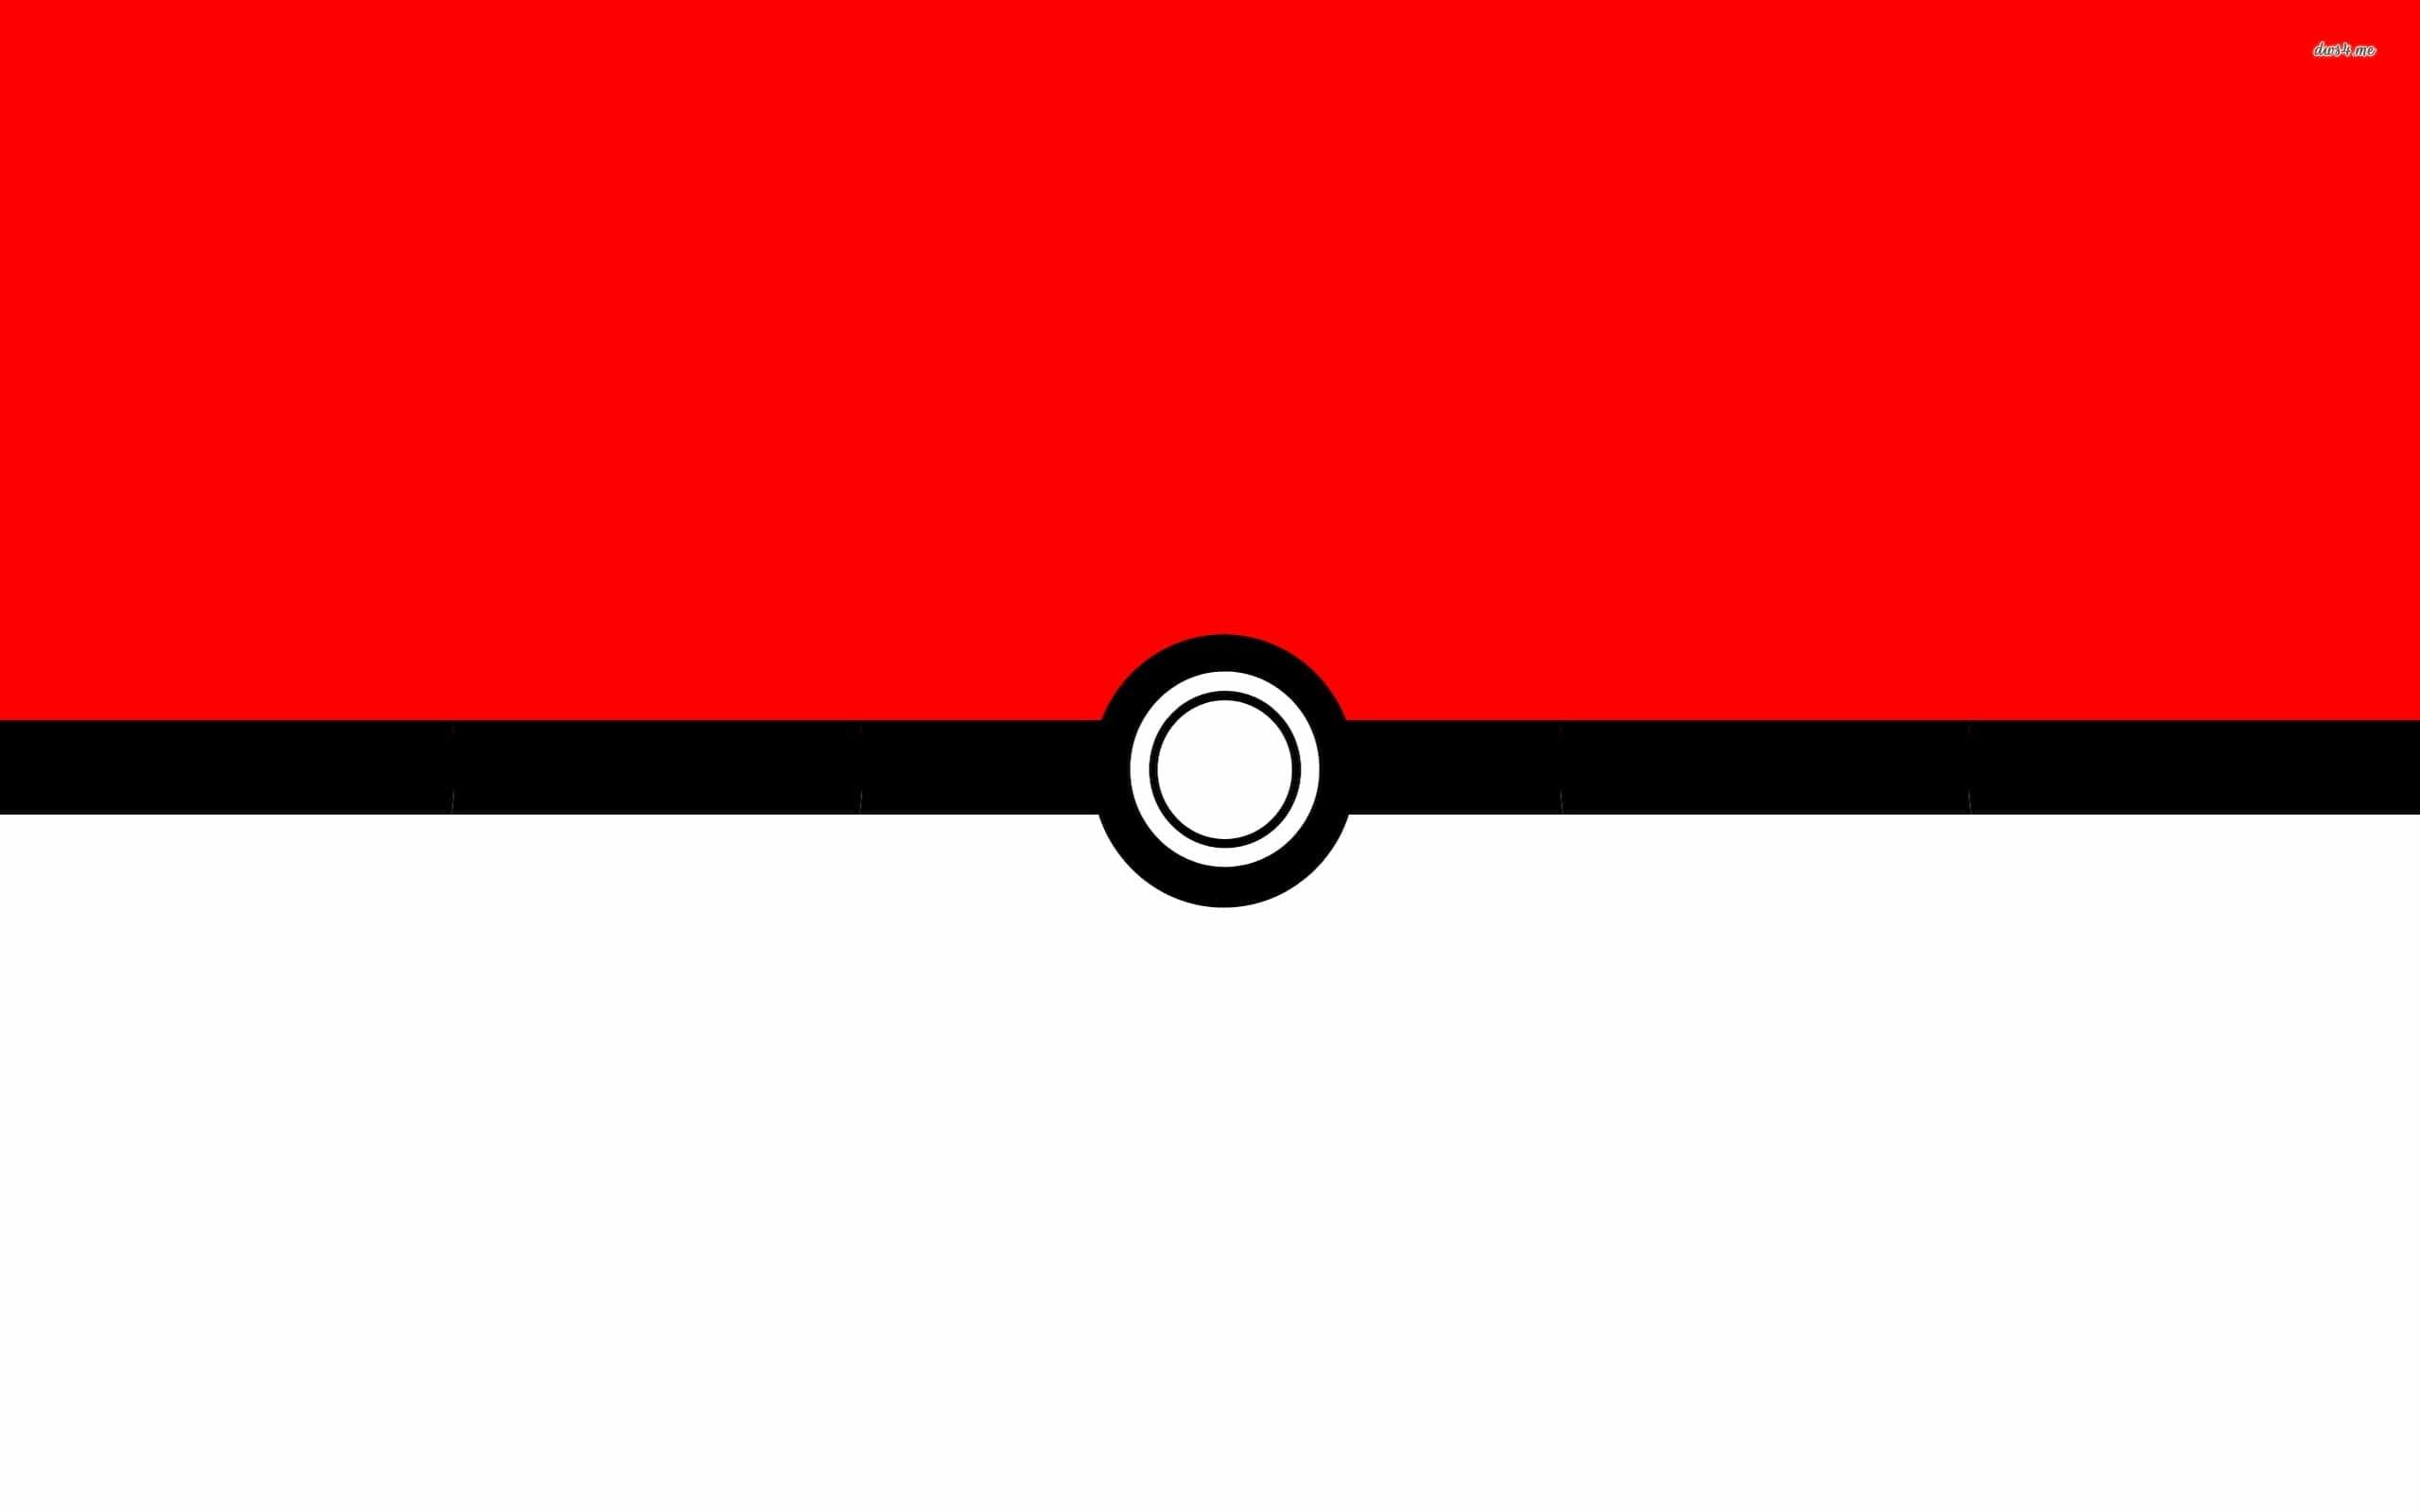 Pokemon Go HD pics Pokemon Go Wallpapers hd